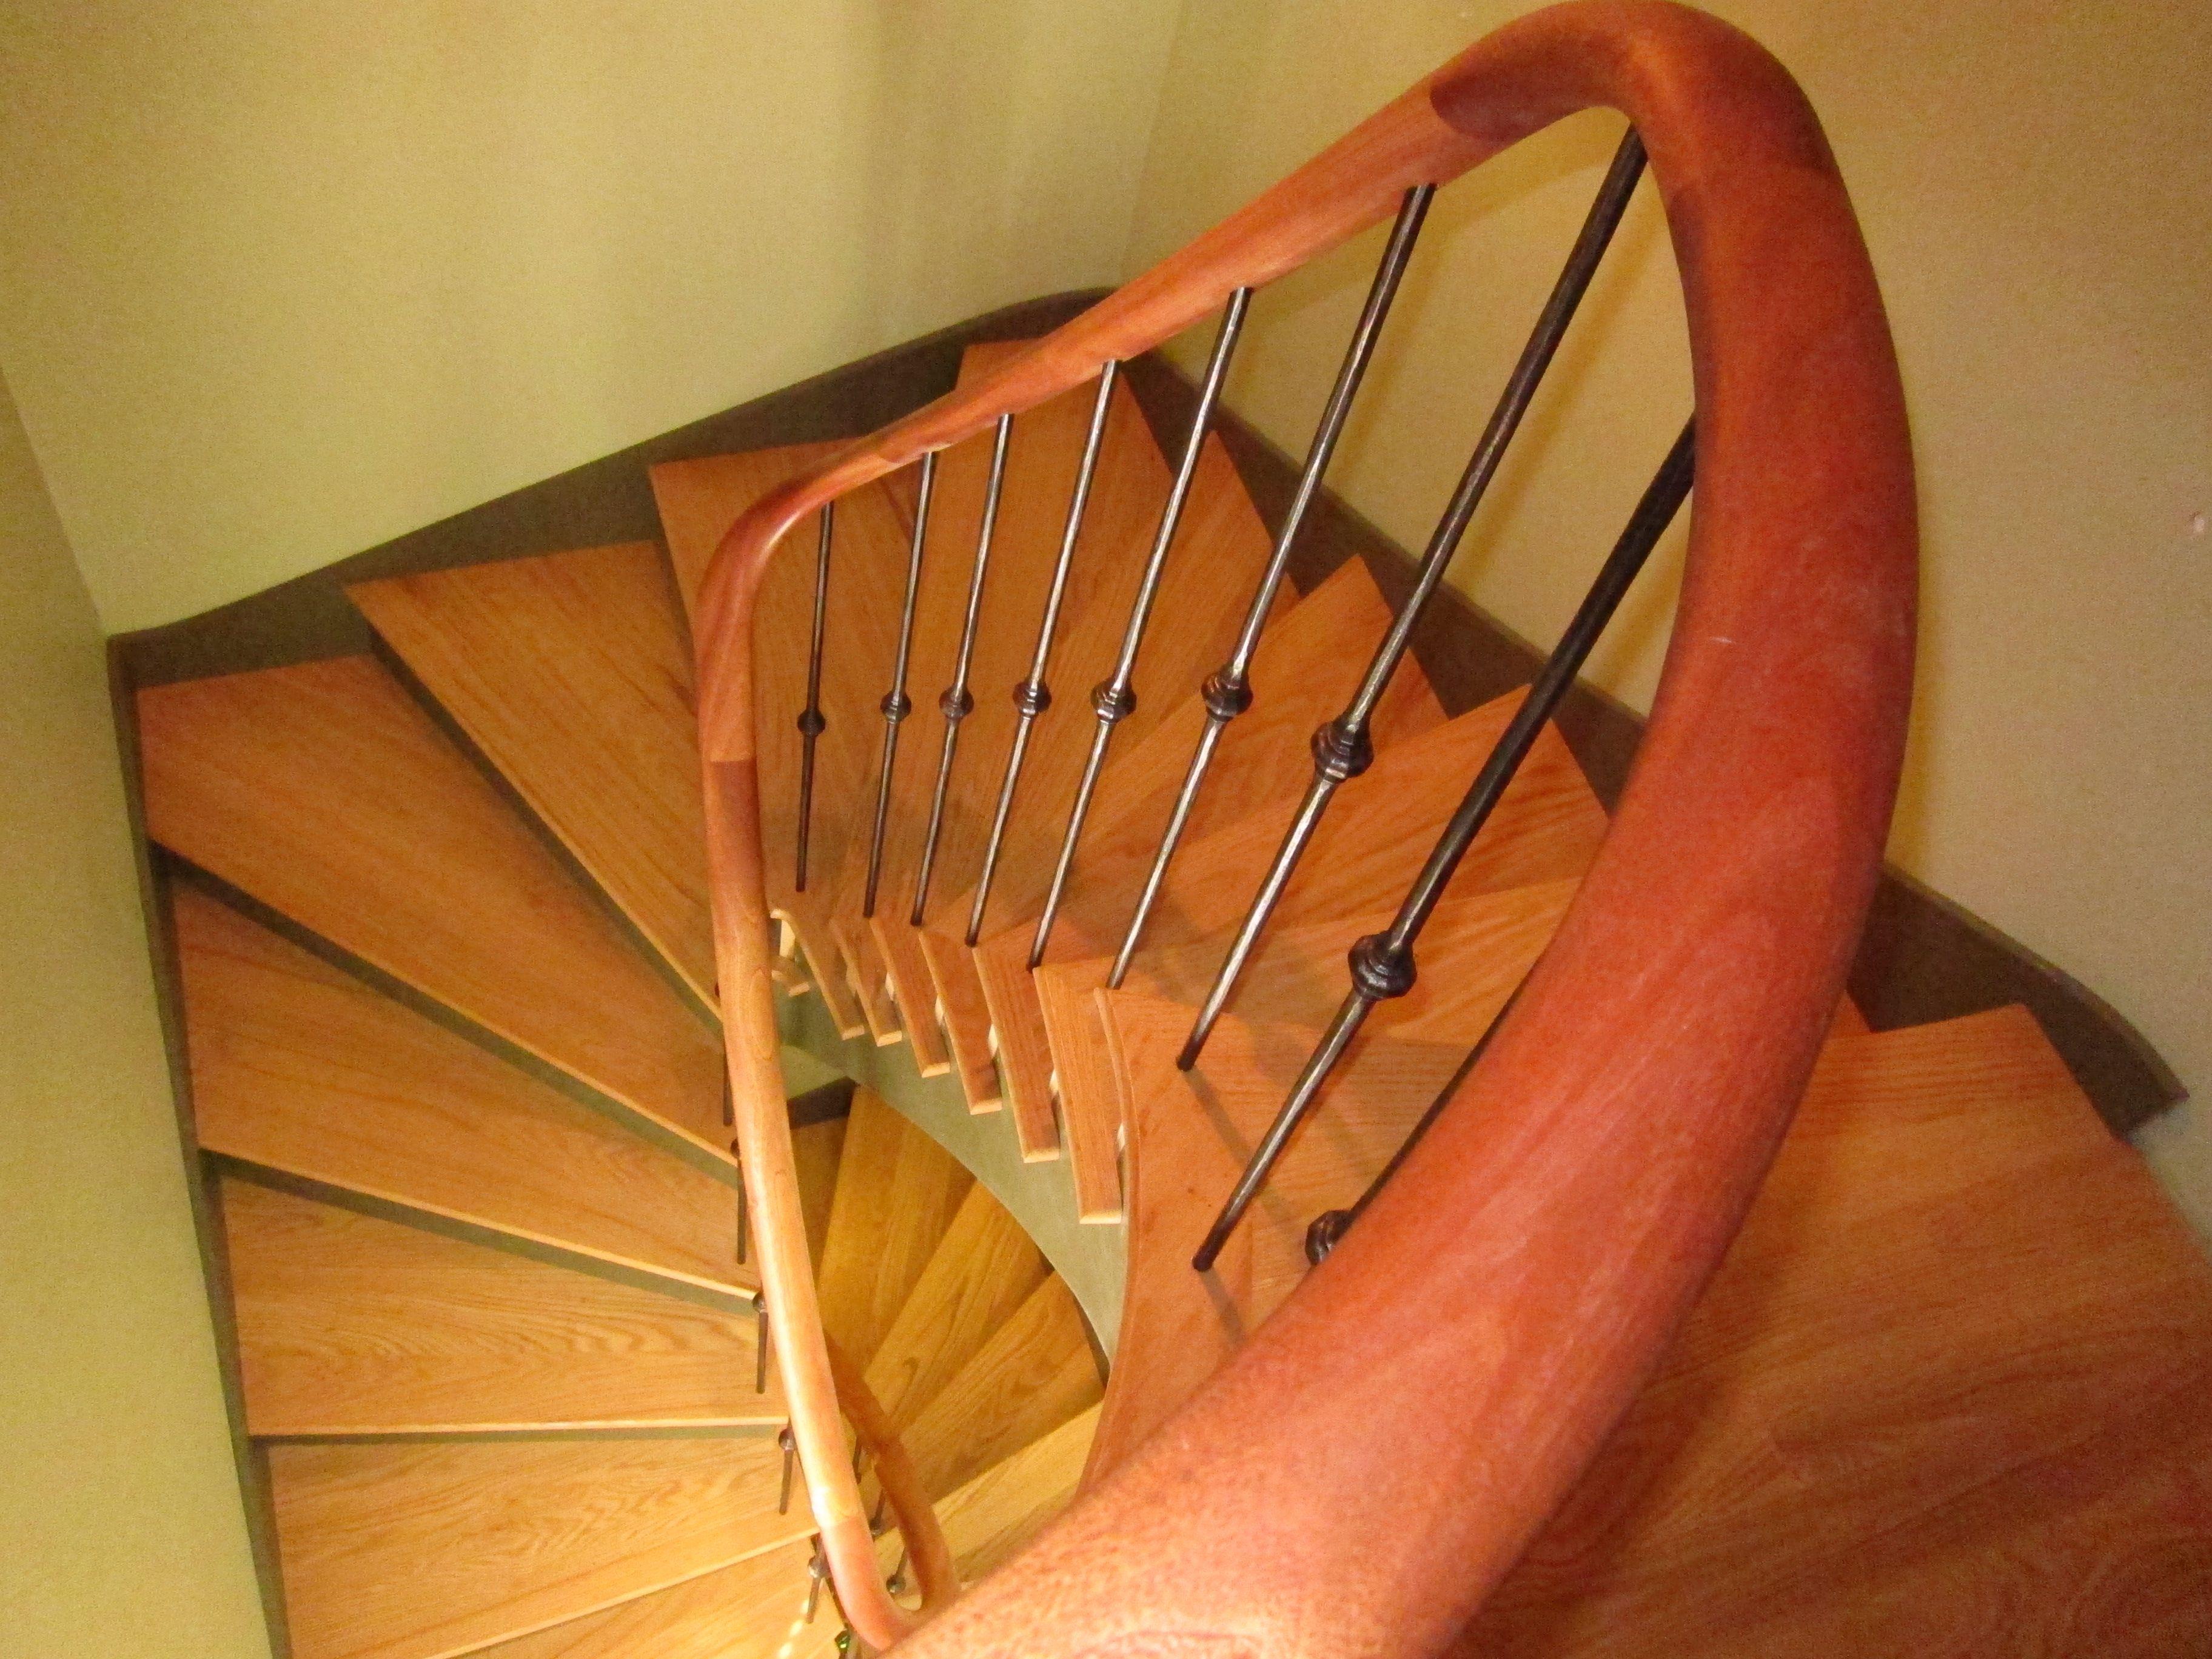 Best Tangent Handrail Custom Handrail Wreath Handrail Stairs Custom Stairs Greek Revival Home 400 x 300